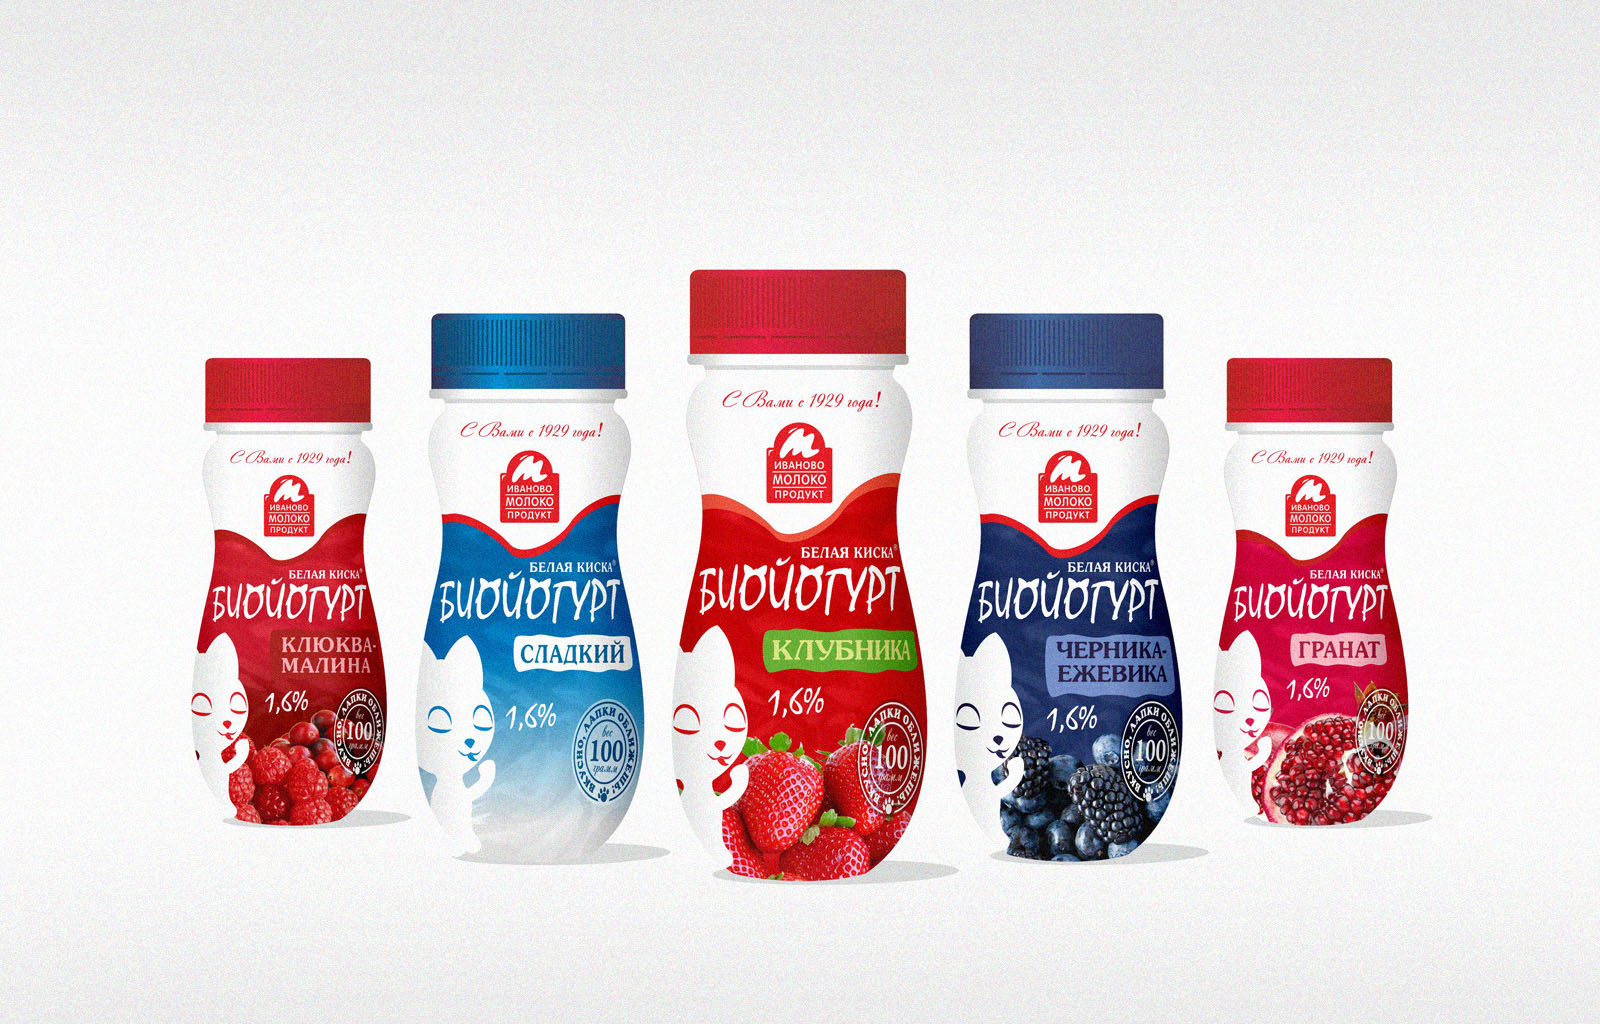 Ивмолоко. Разработка на заказ упаковки йогурт